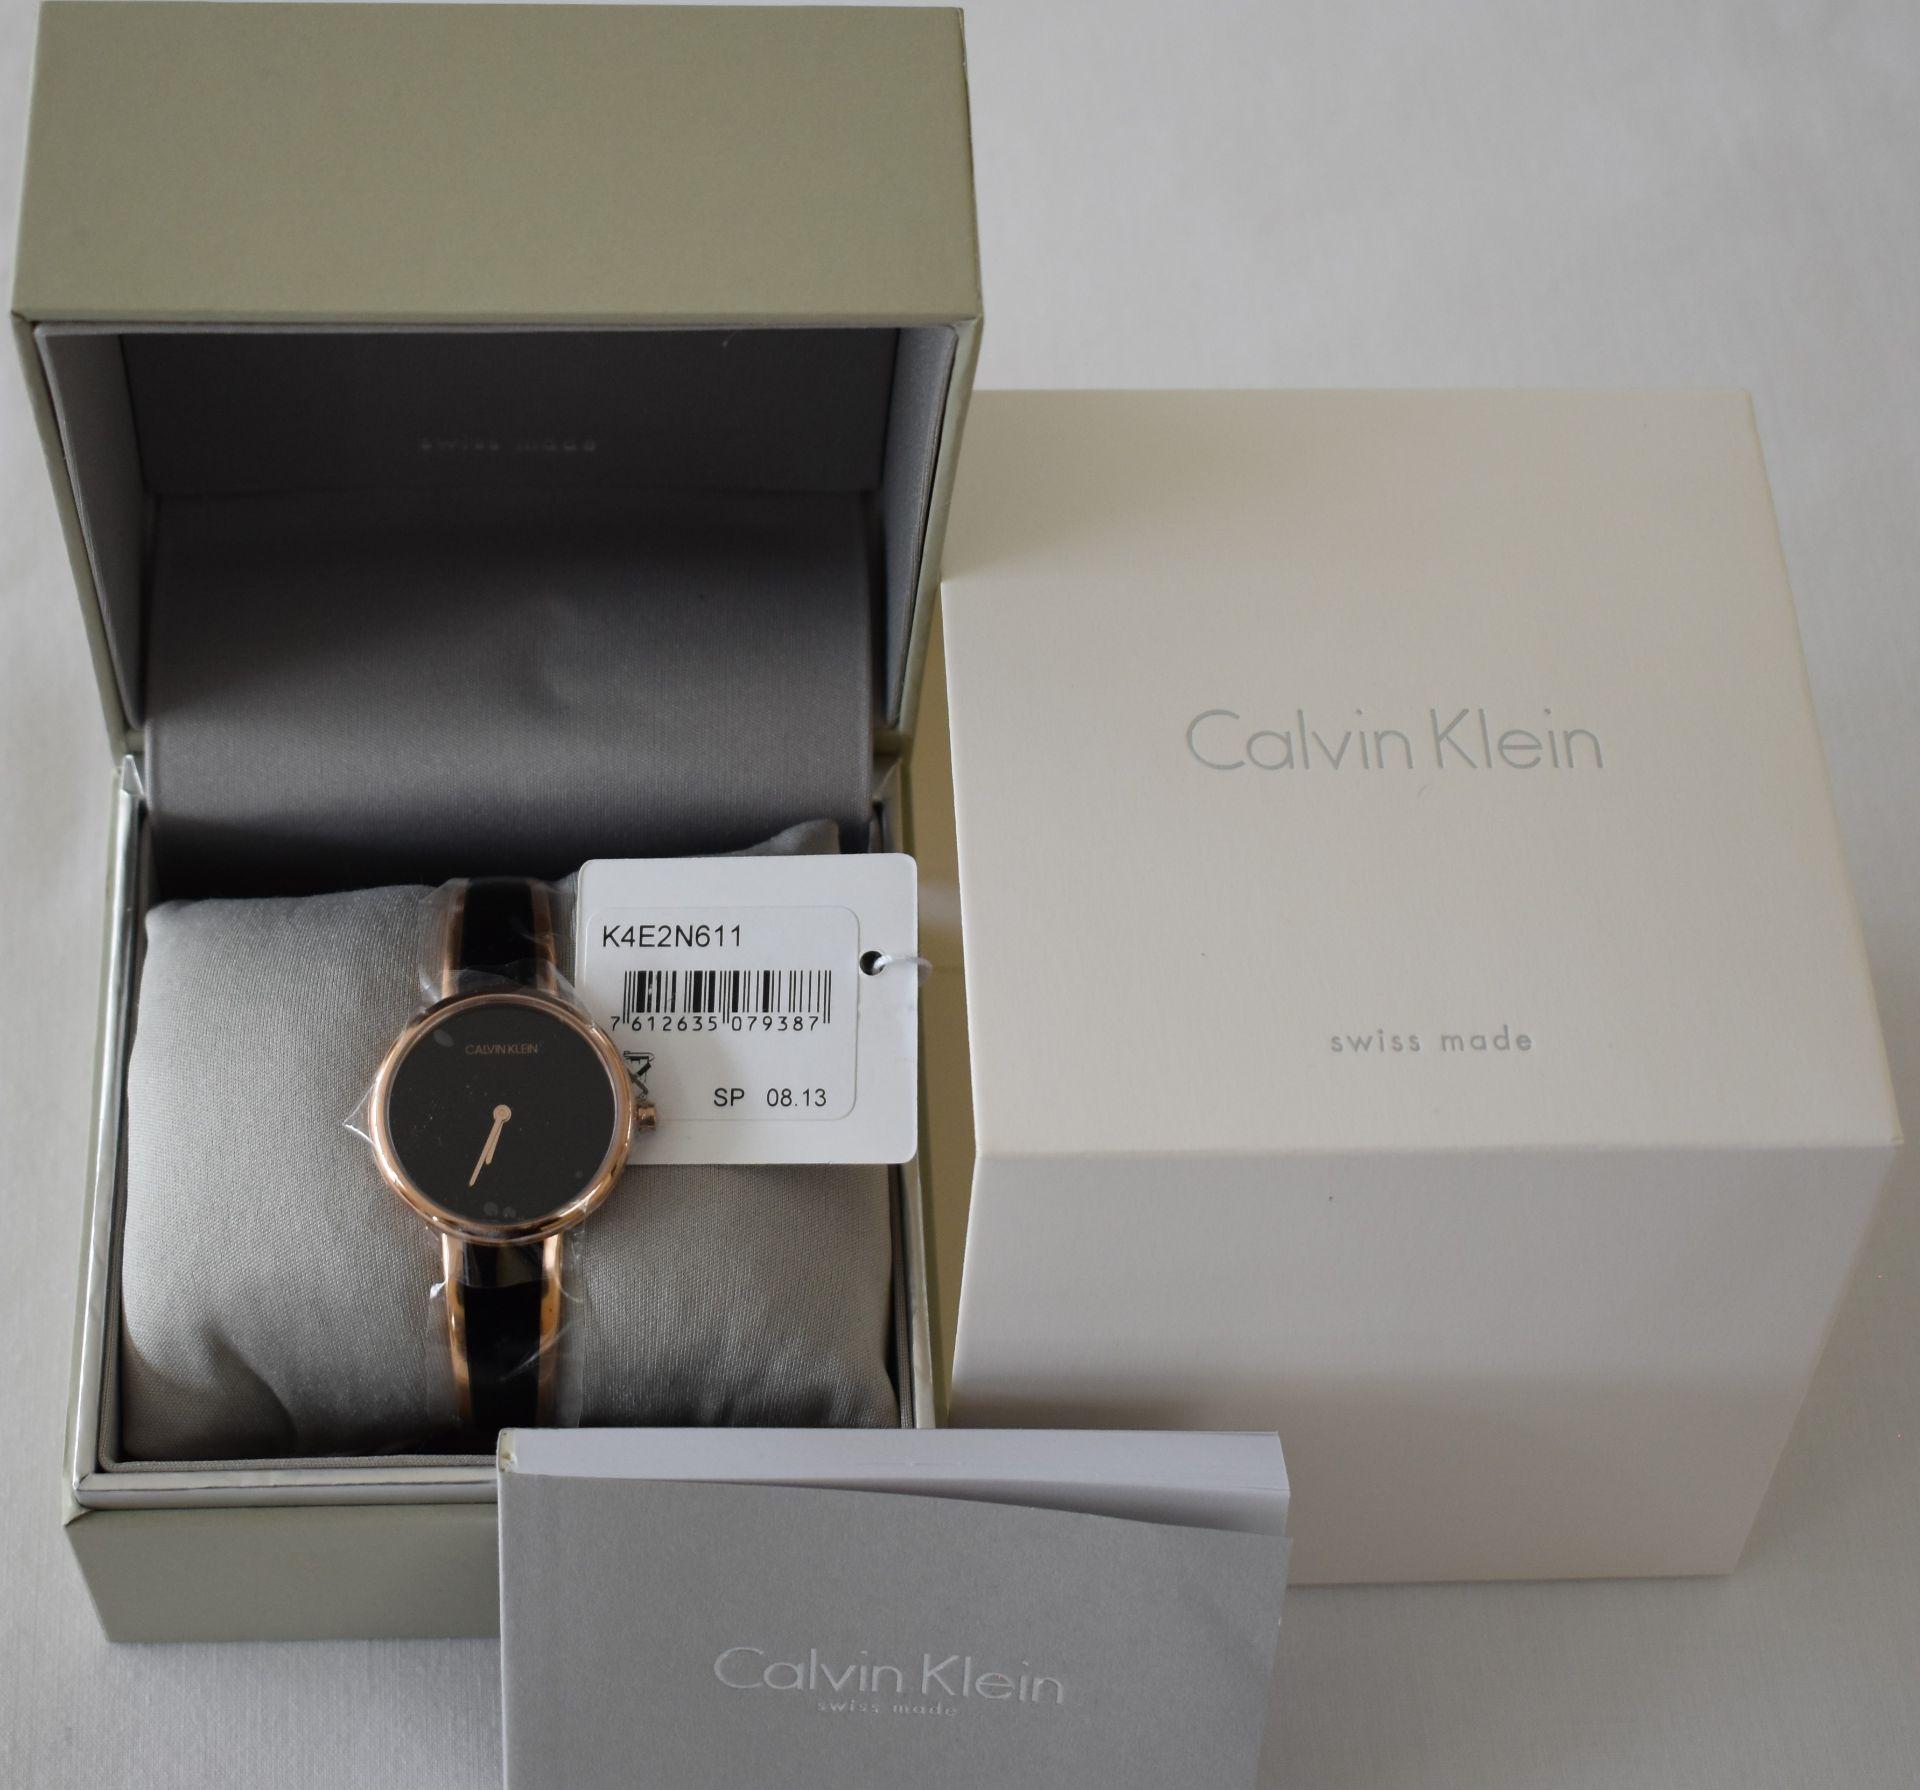 Calvin klein K4E2N611 Ladies Watch - Image 2 of 2